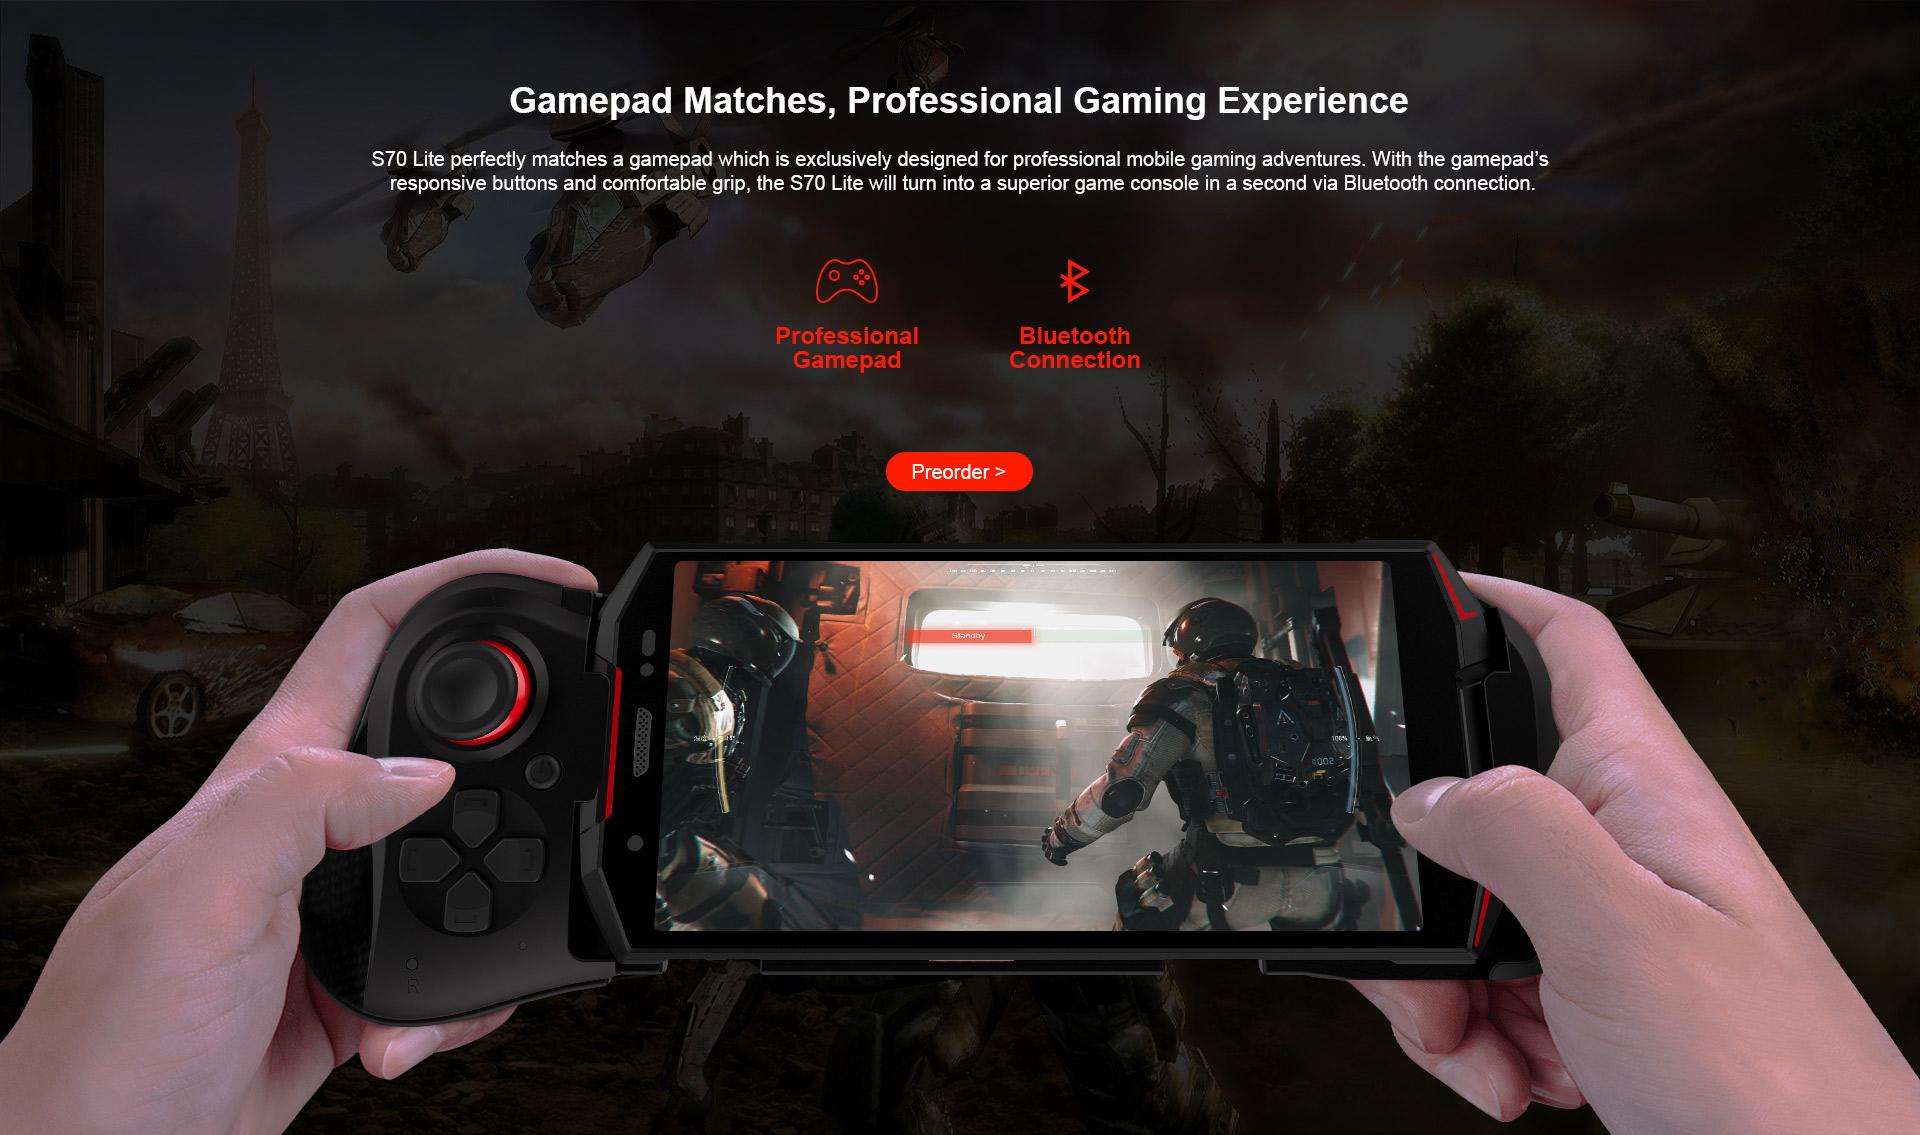 Gamepad S70 Lite